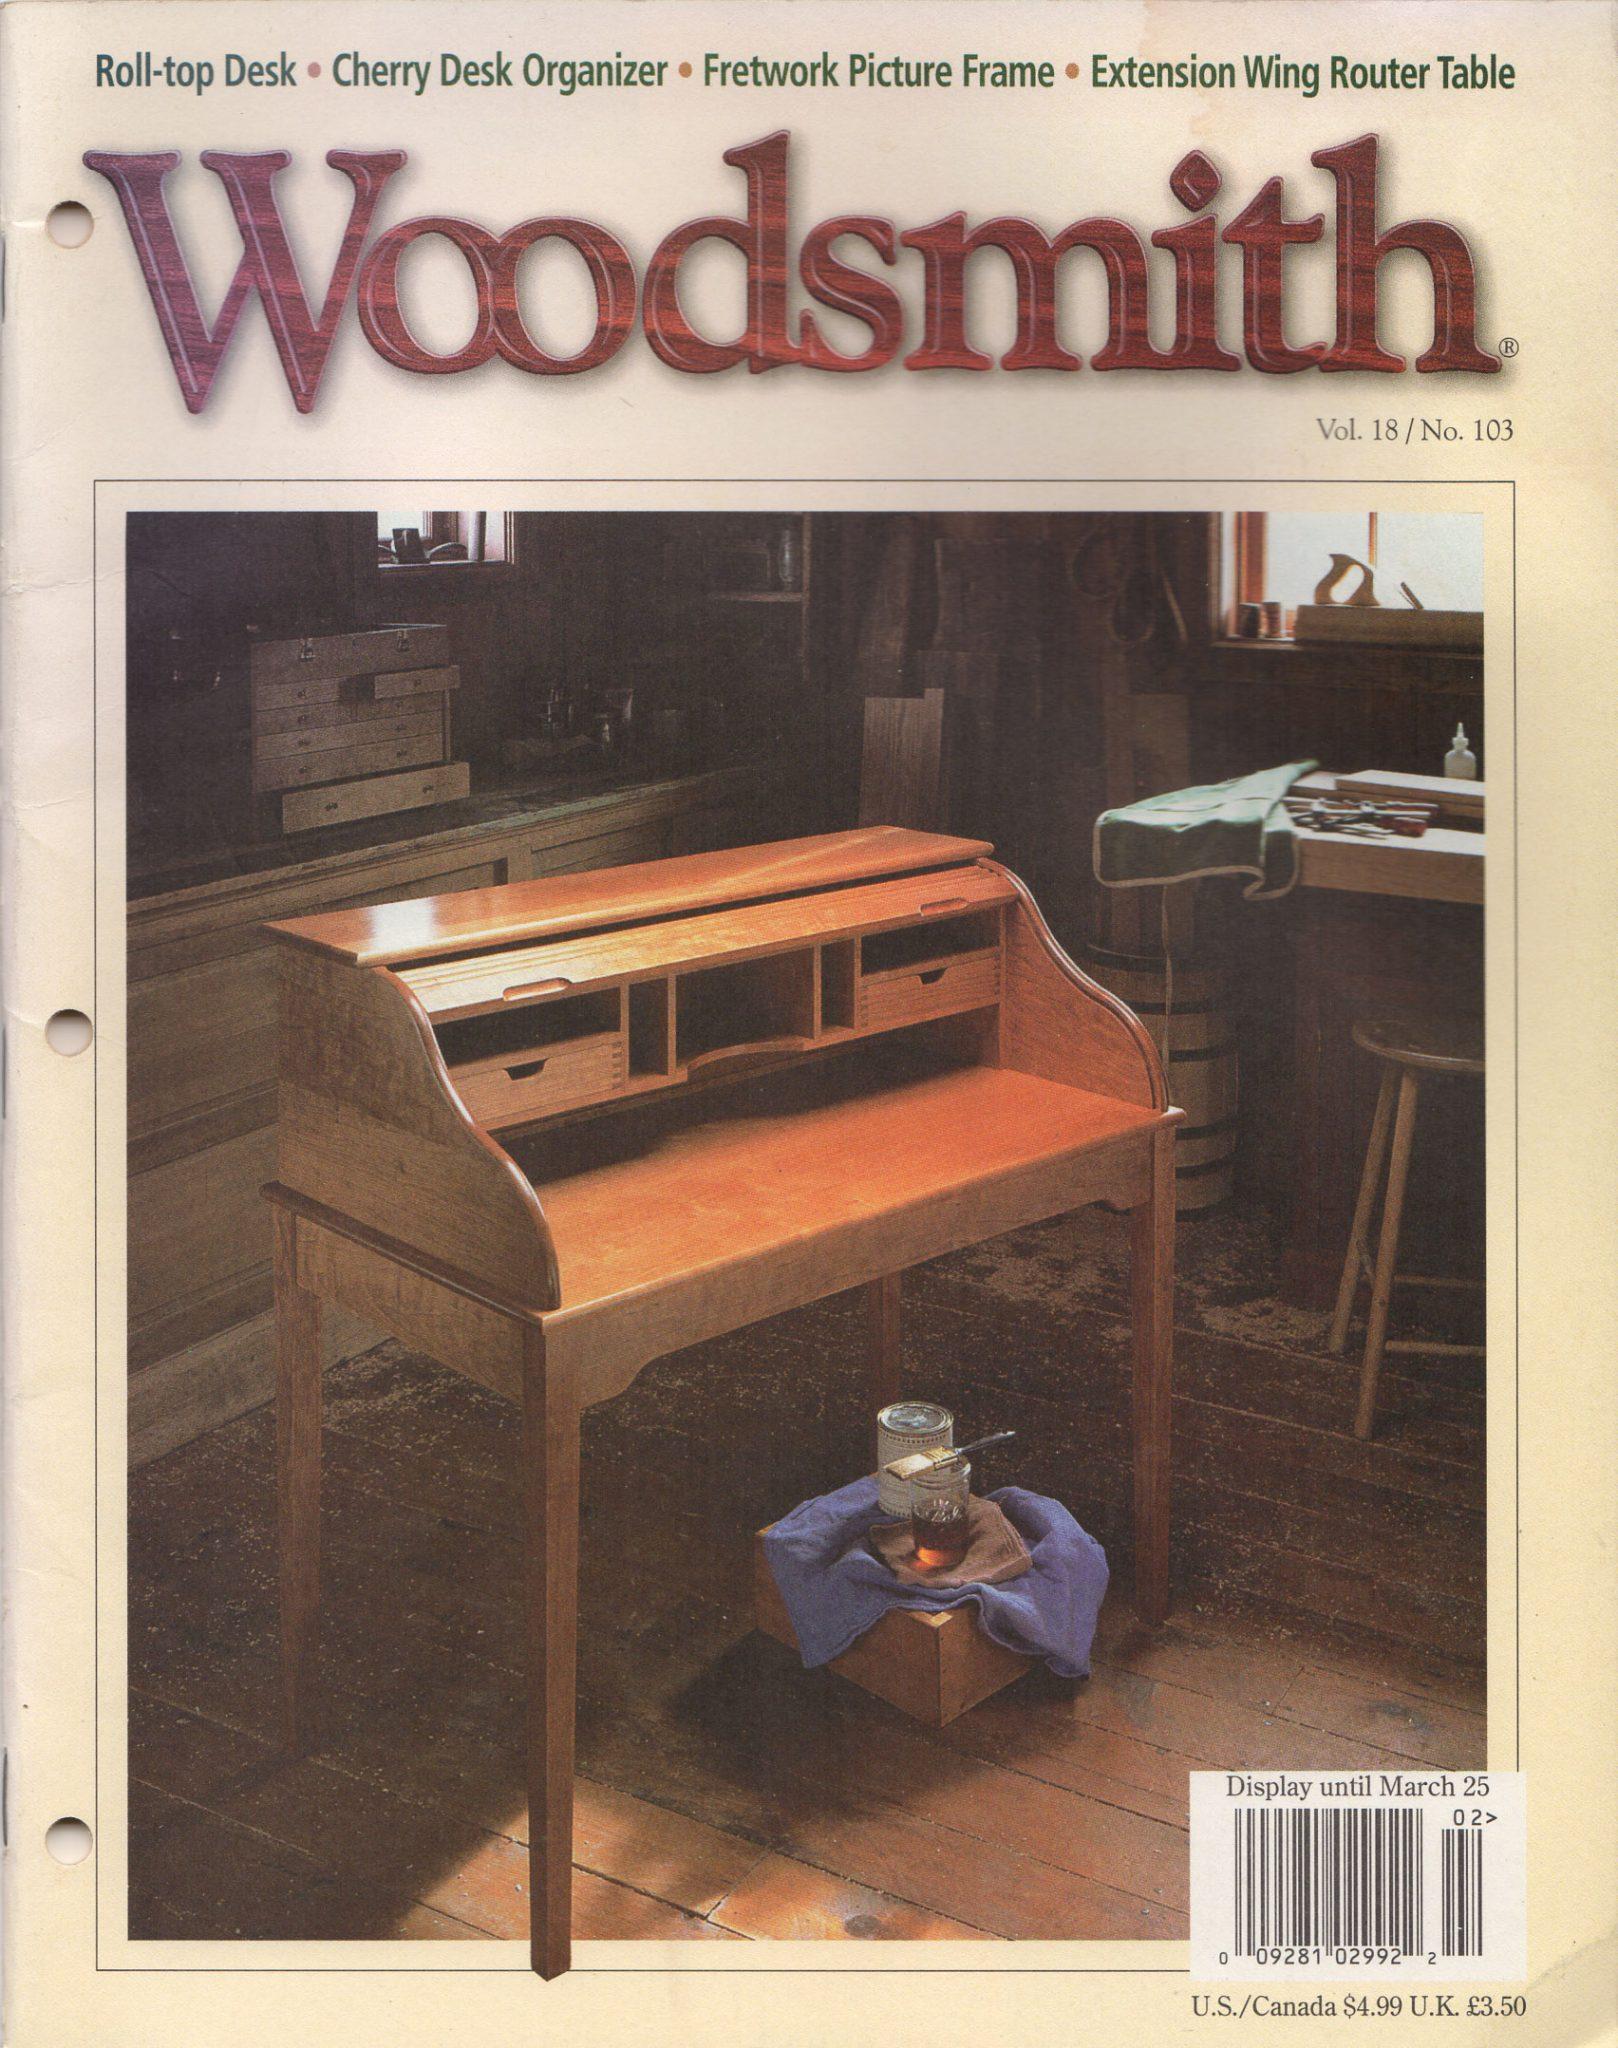 Woodsmith Vol 18 No 103 Roll Top Desck Desk Organizer Frame